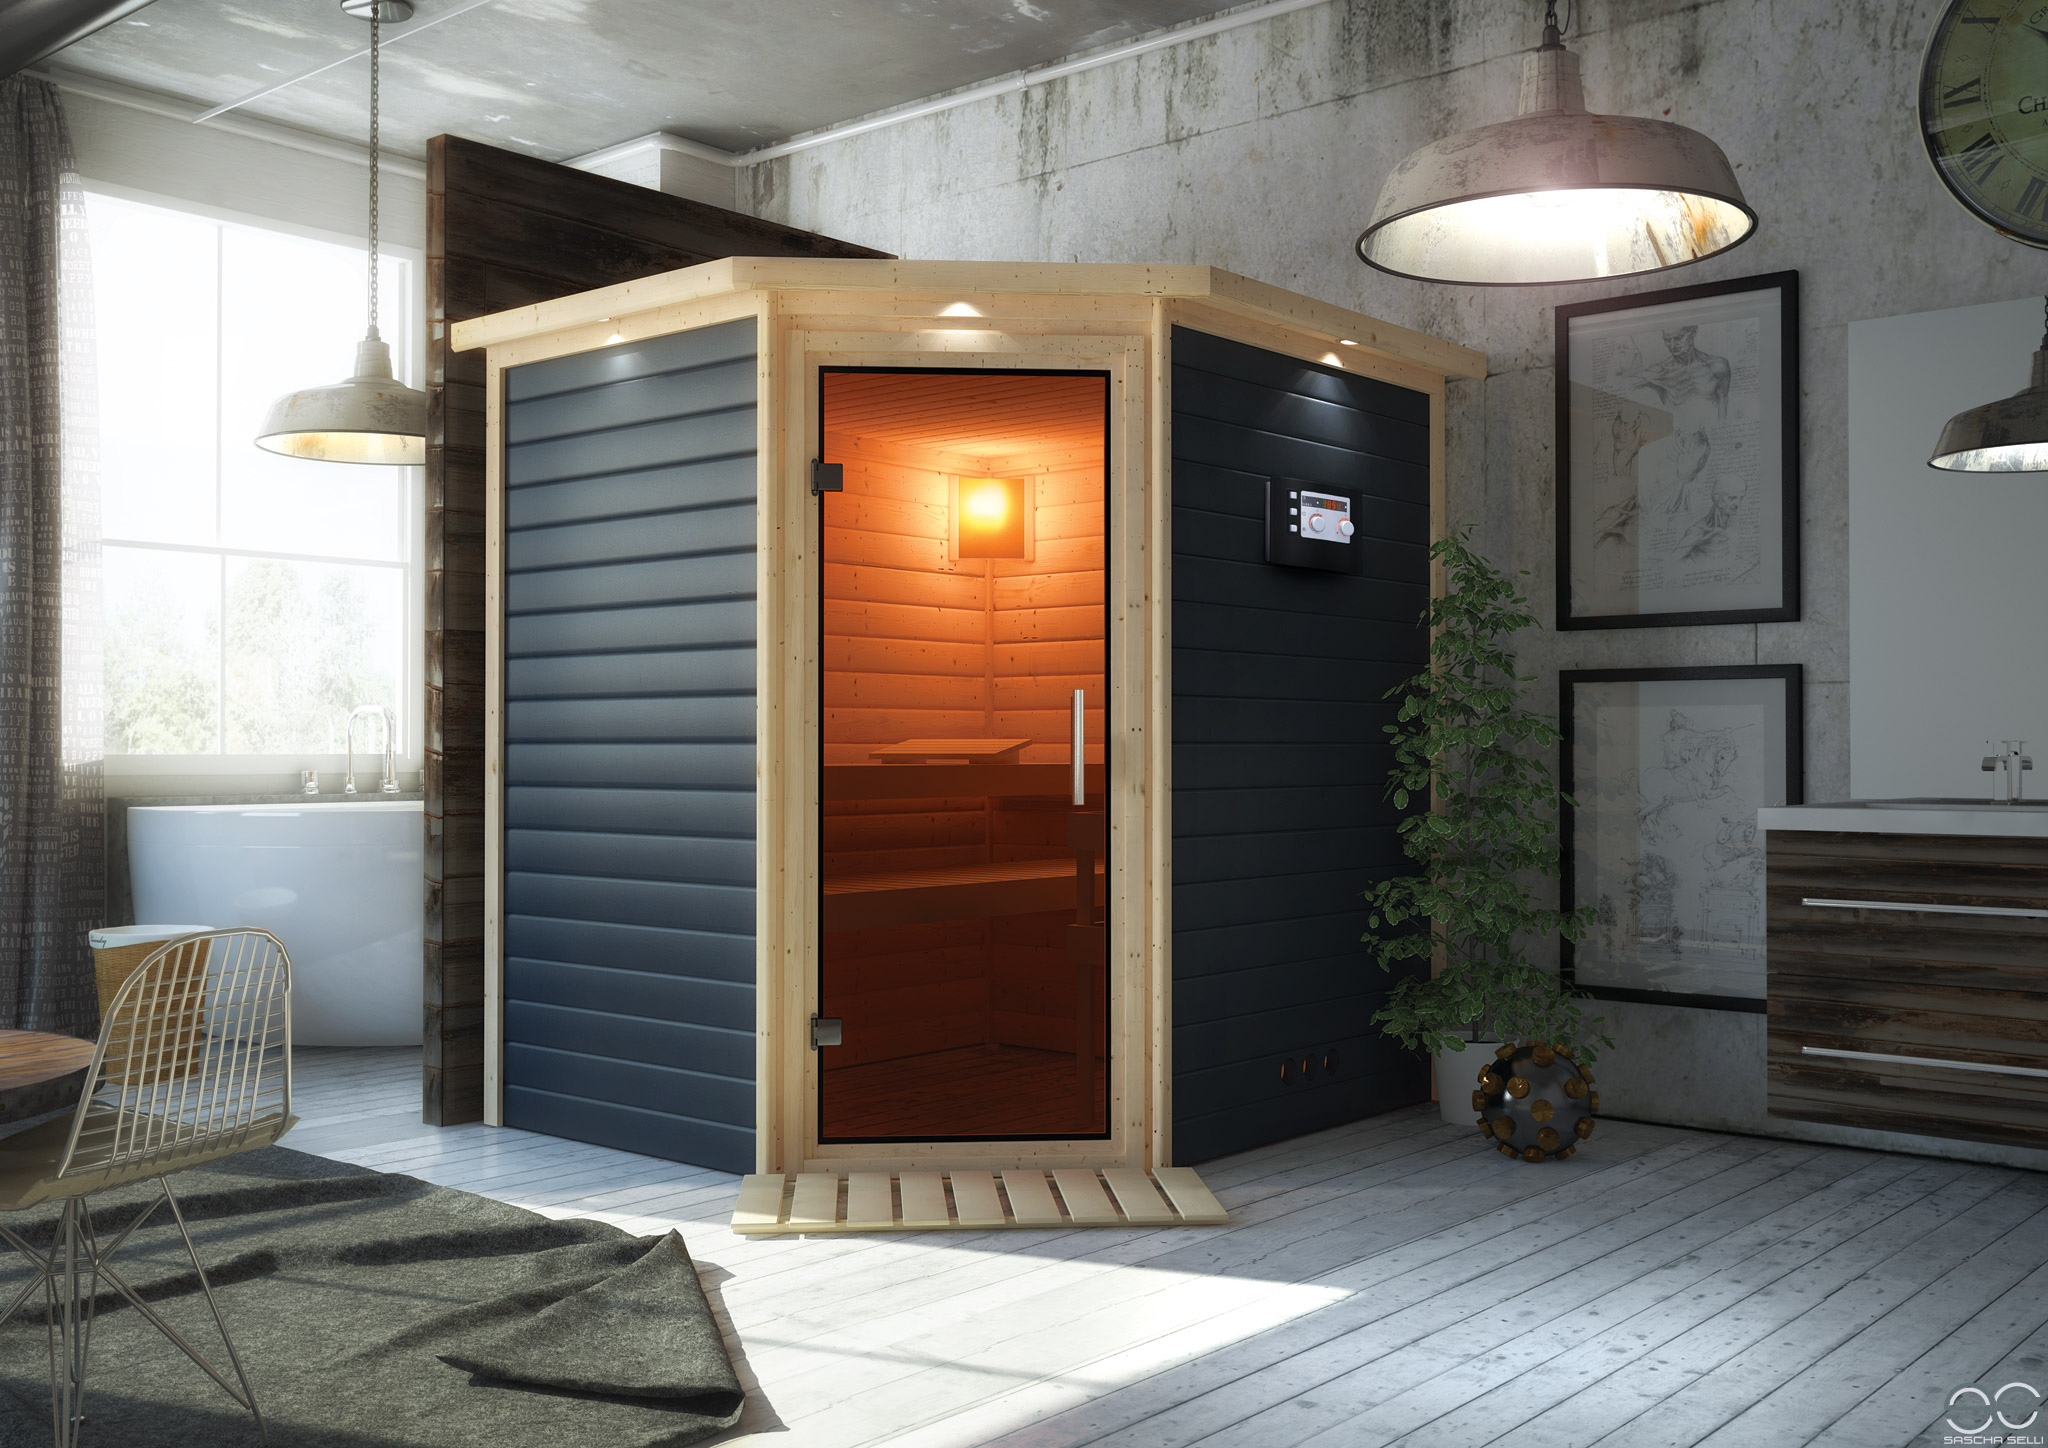 karibu sauna mia saschaselli. Black Bedroom Furniture Sets. Home Design Ideas